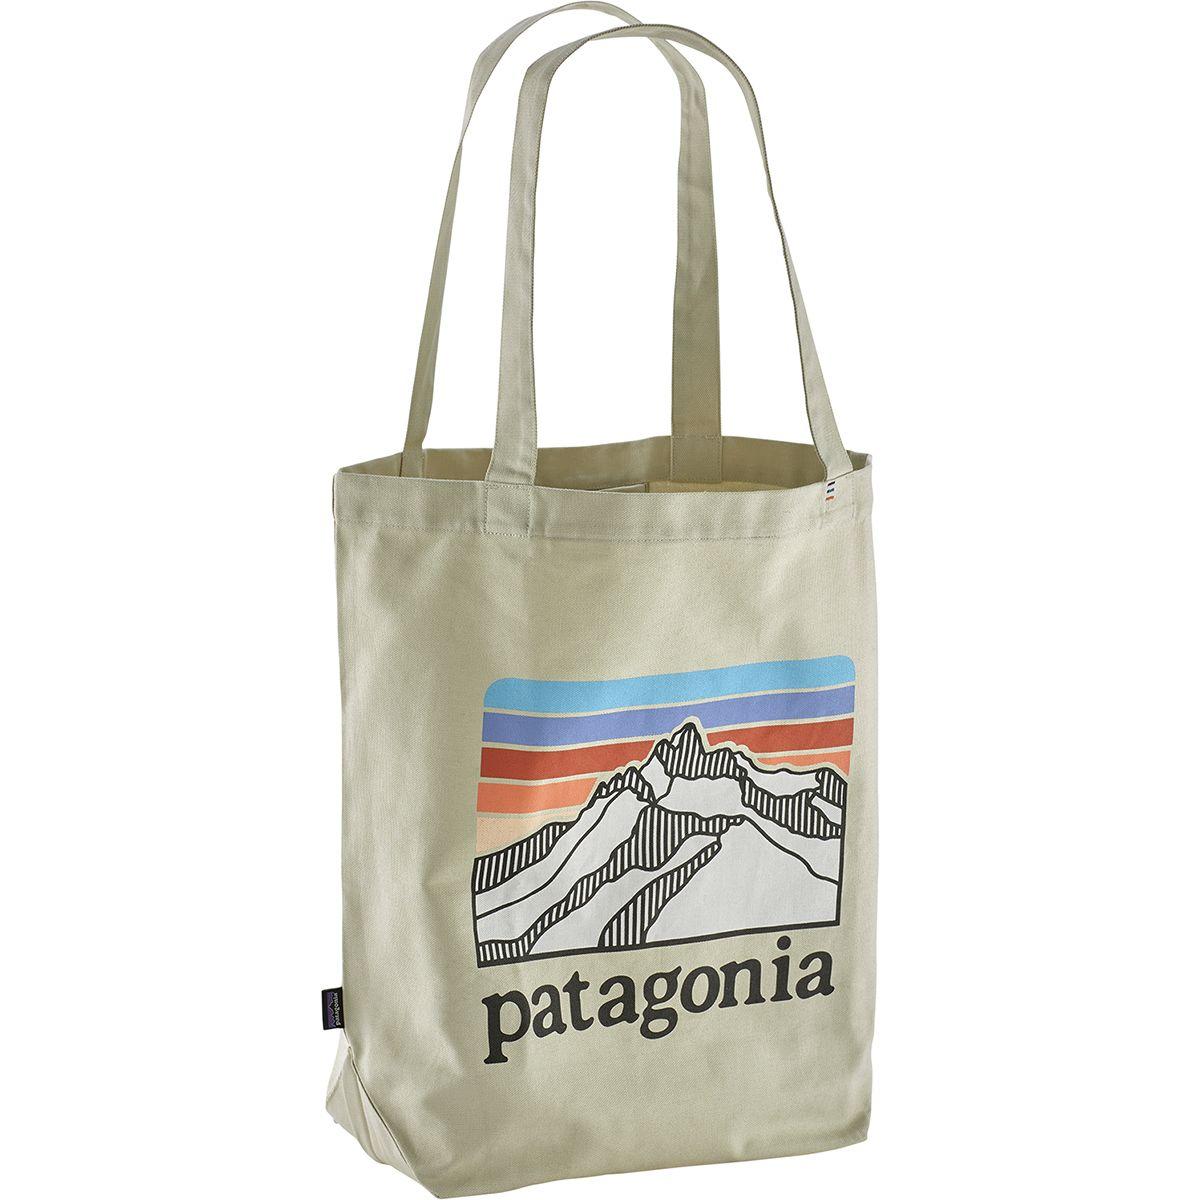 12 Ways to be a Responsible Traveler - Patagonia Tote